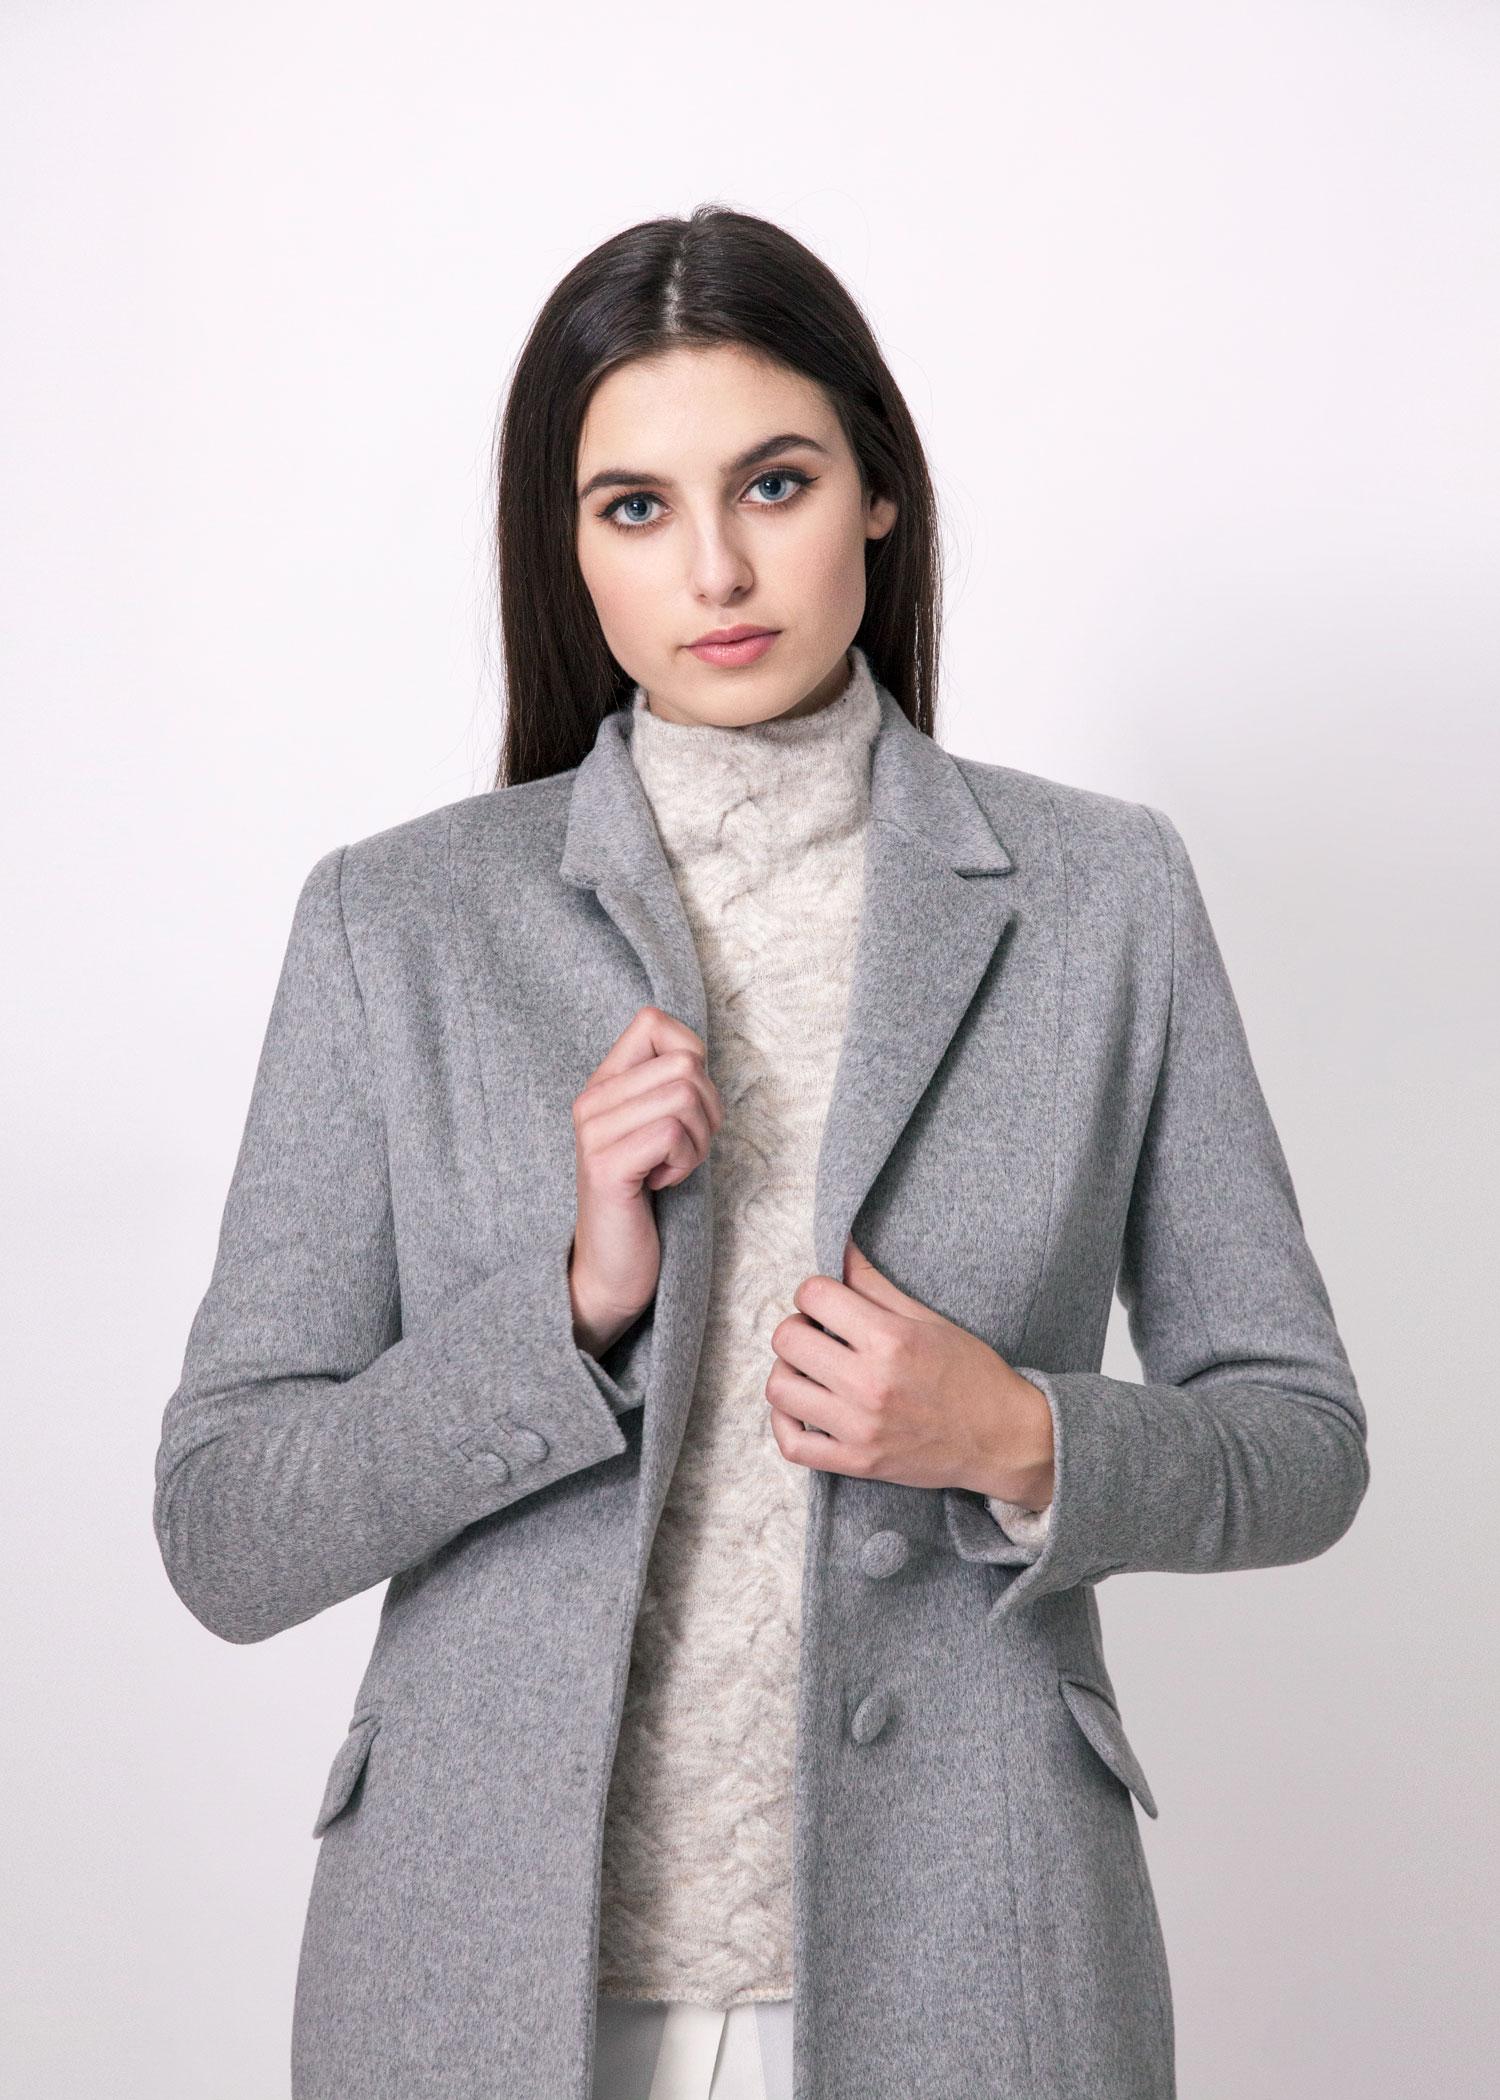 Portrait-Grey-Coat.jpg